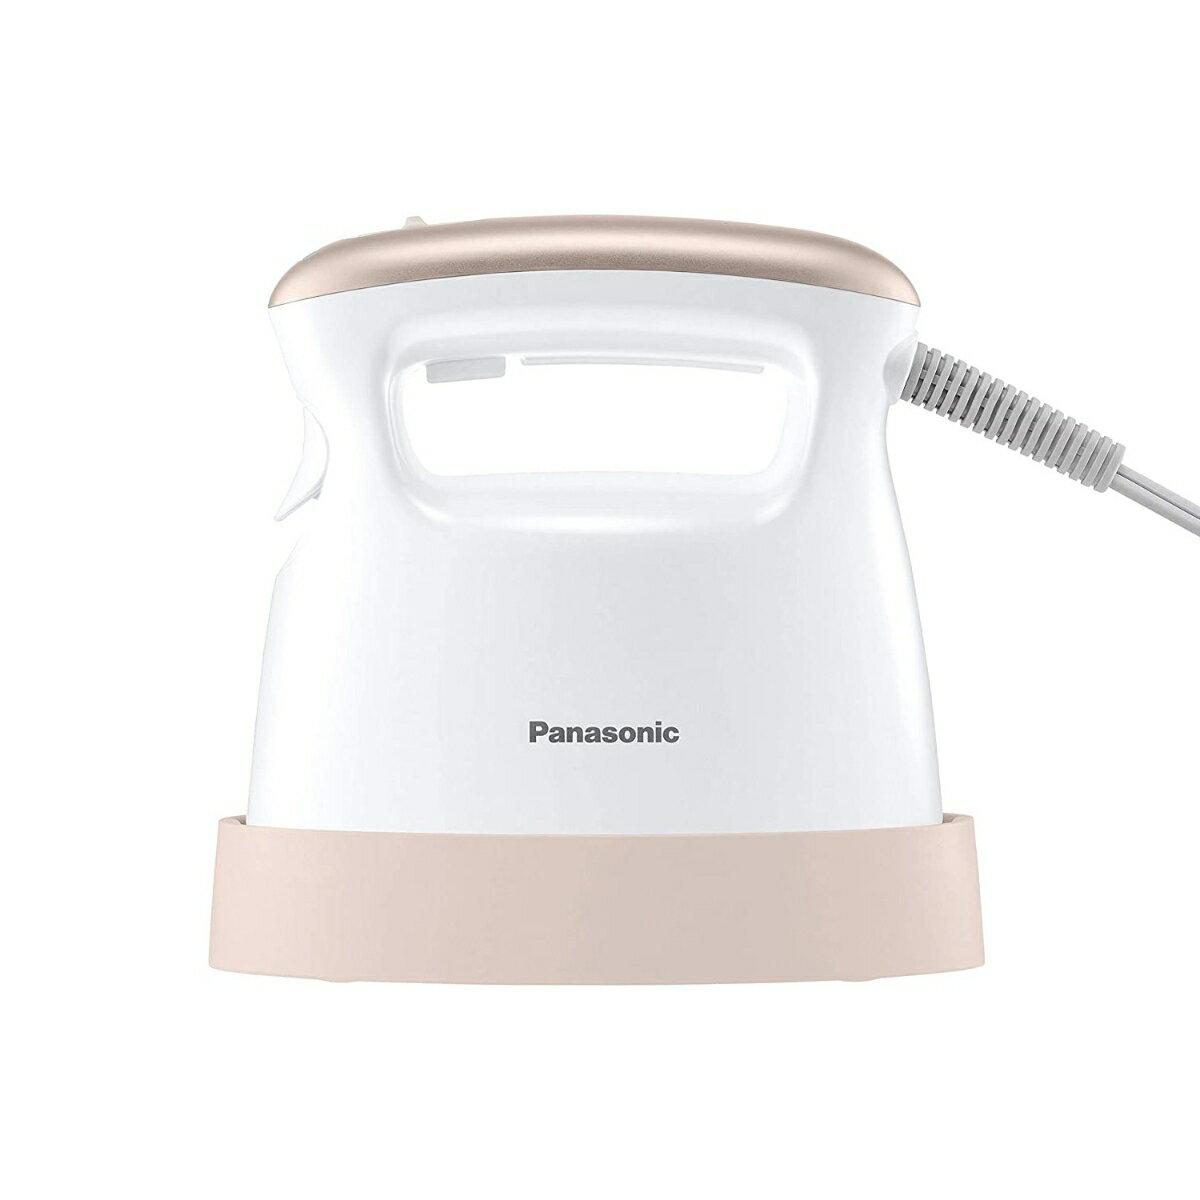 Panasonic 衣類スチーマー NI-FS410-PN